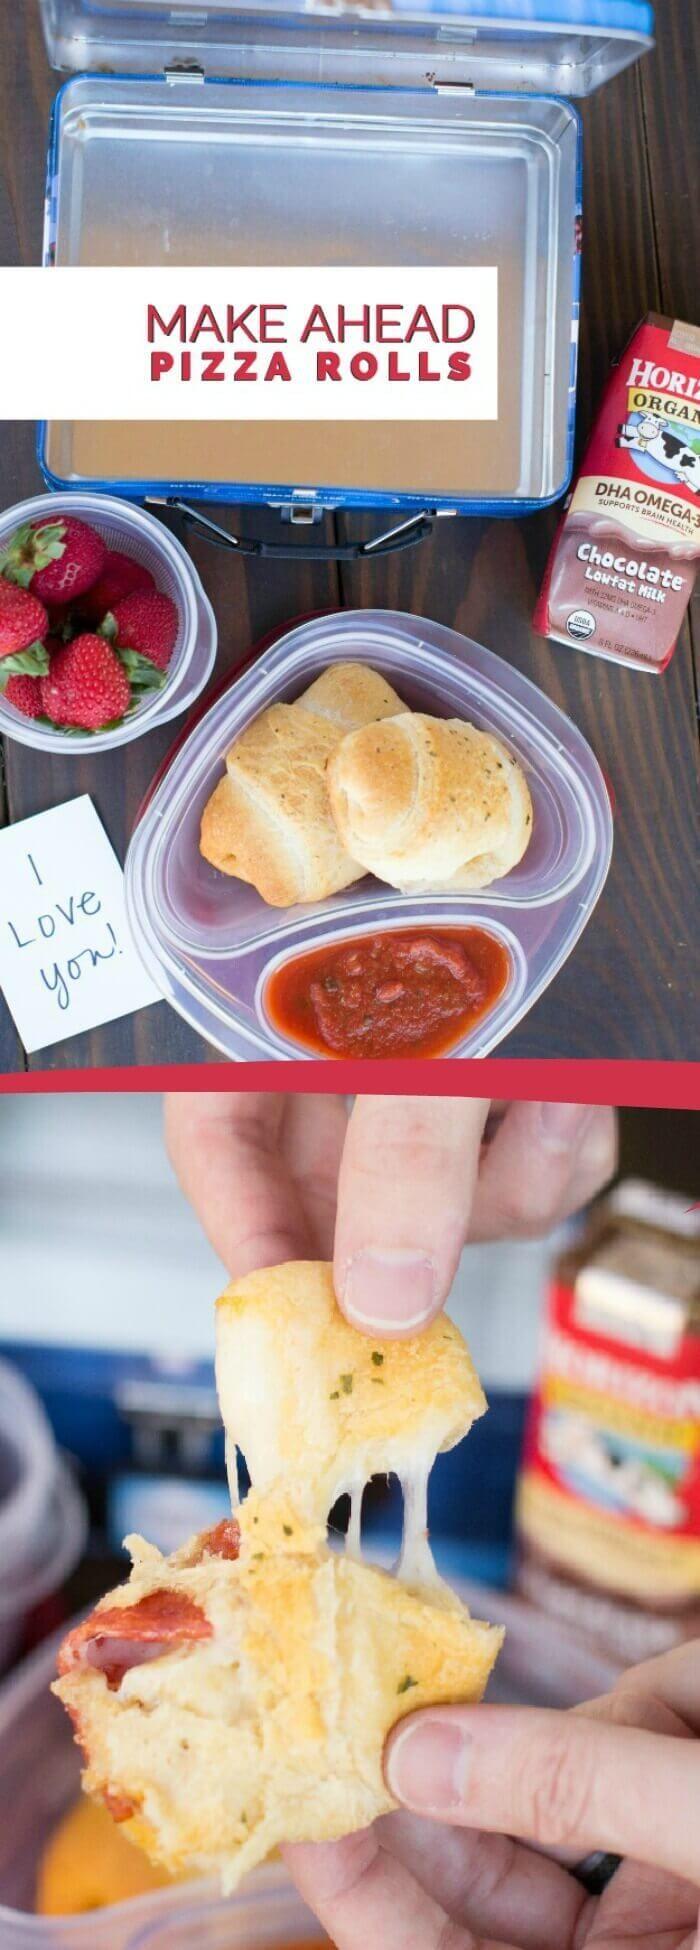 Kid's Lunch Ideas: Make Ahead Pizza Rolls via @spaceshipslb